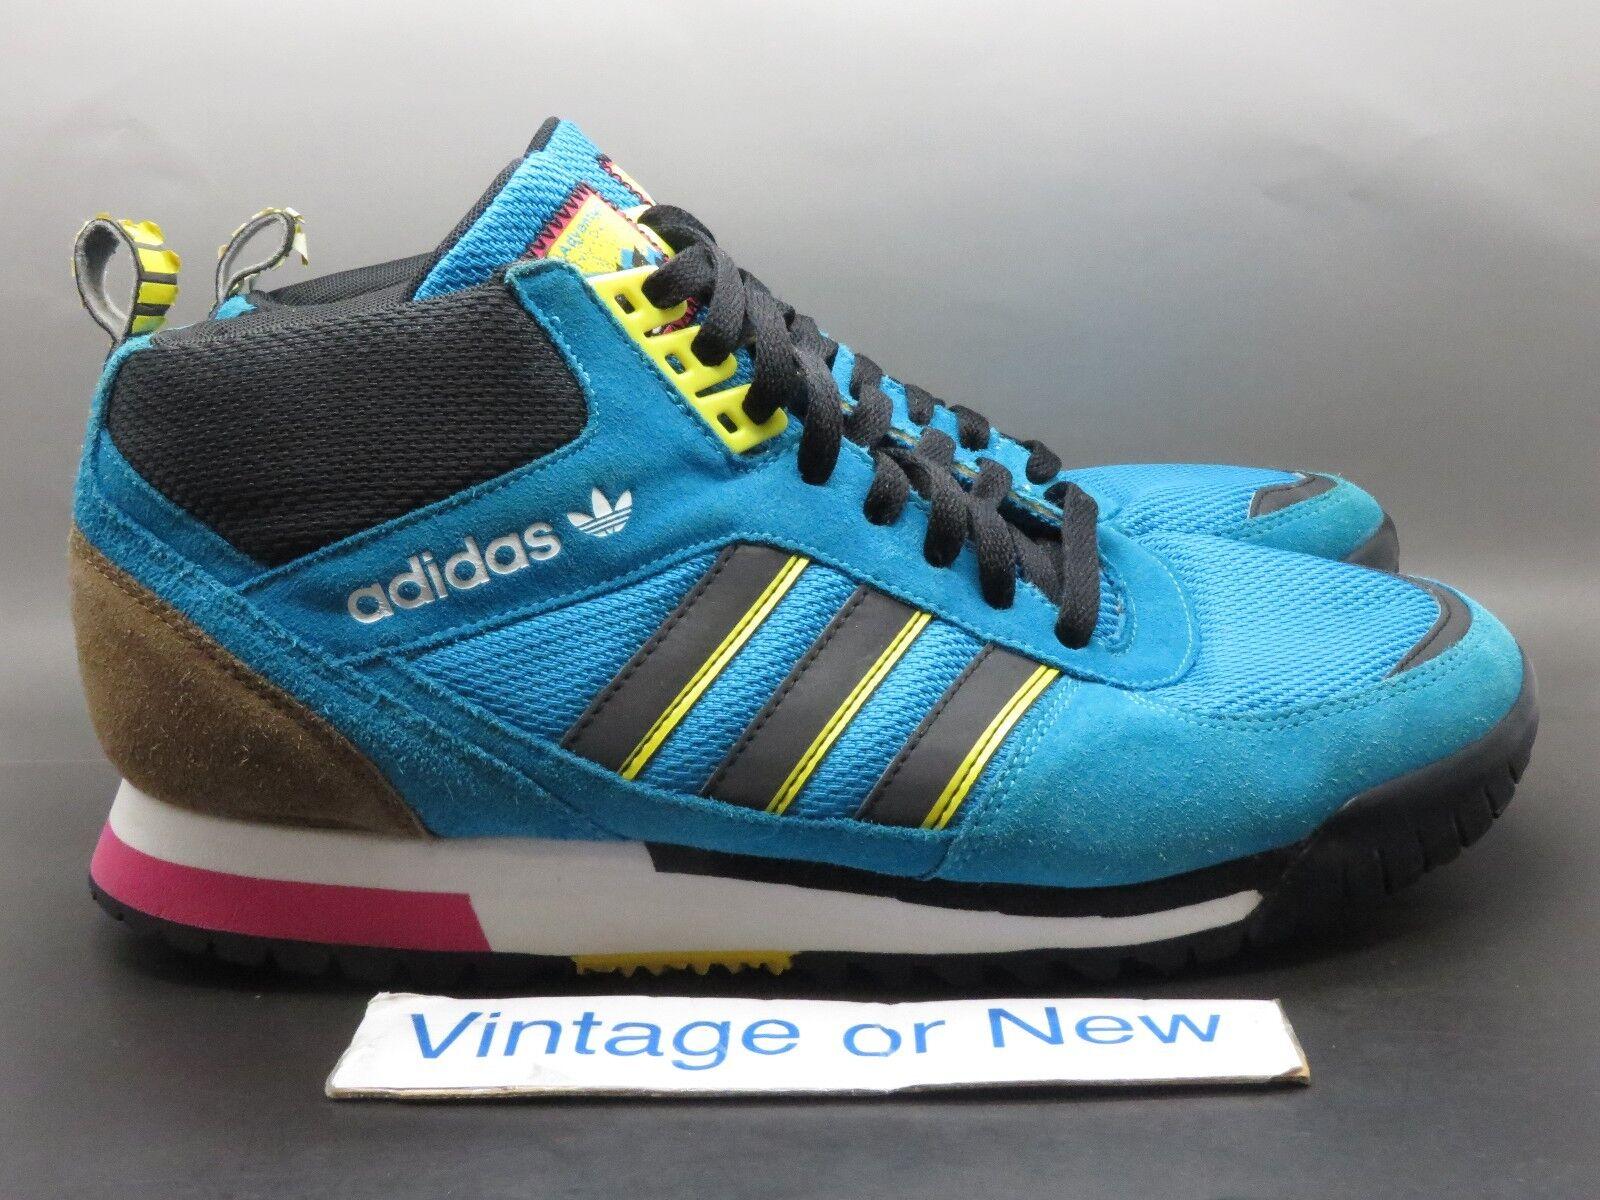 Men's Adidas Originals ZX TR Mid Turquoise Yellow Black Trail G66275 sz 11